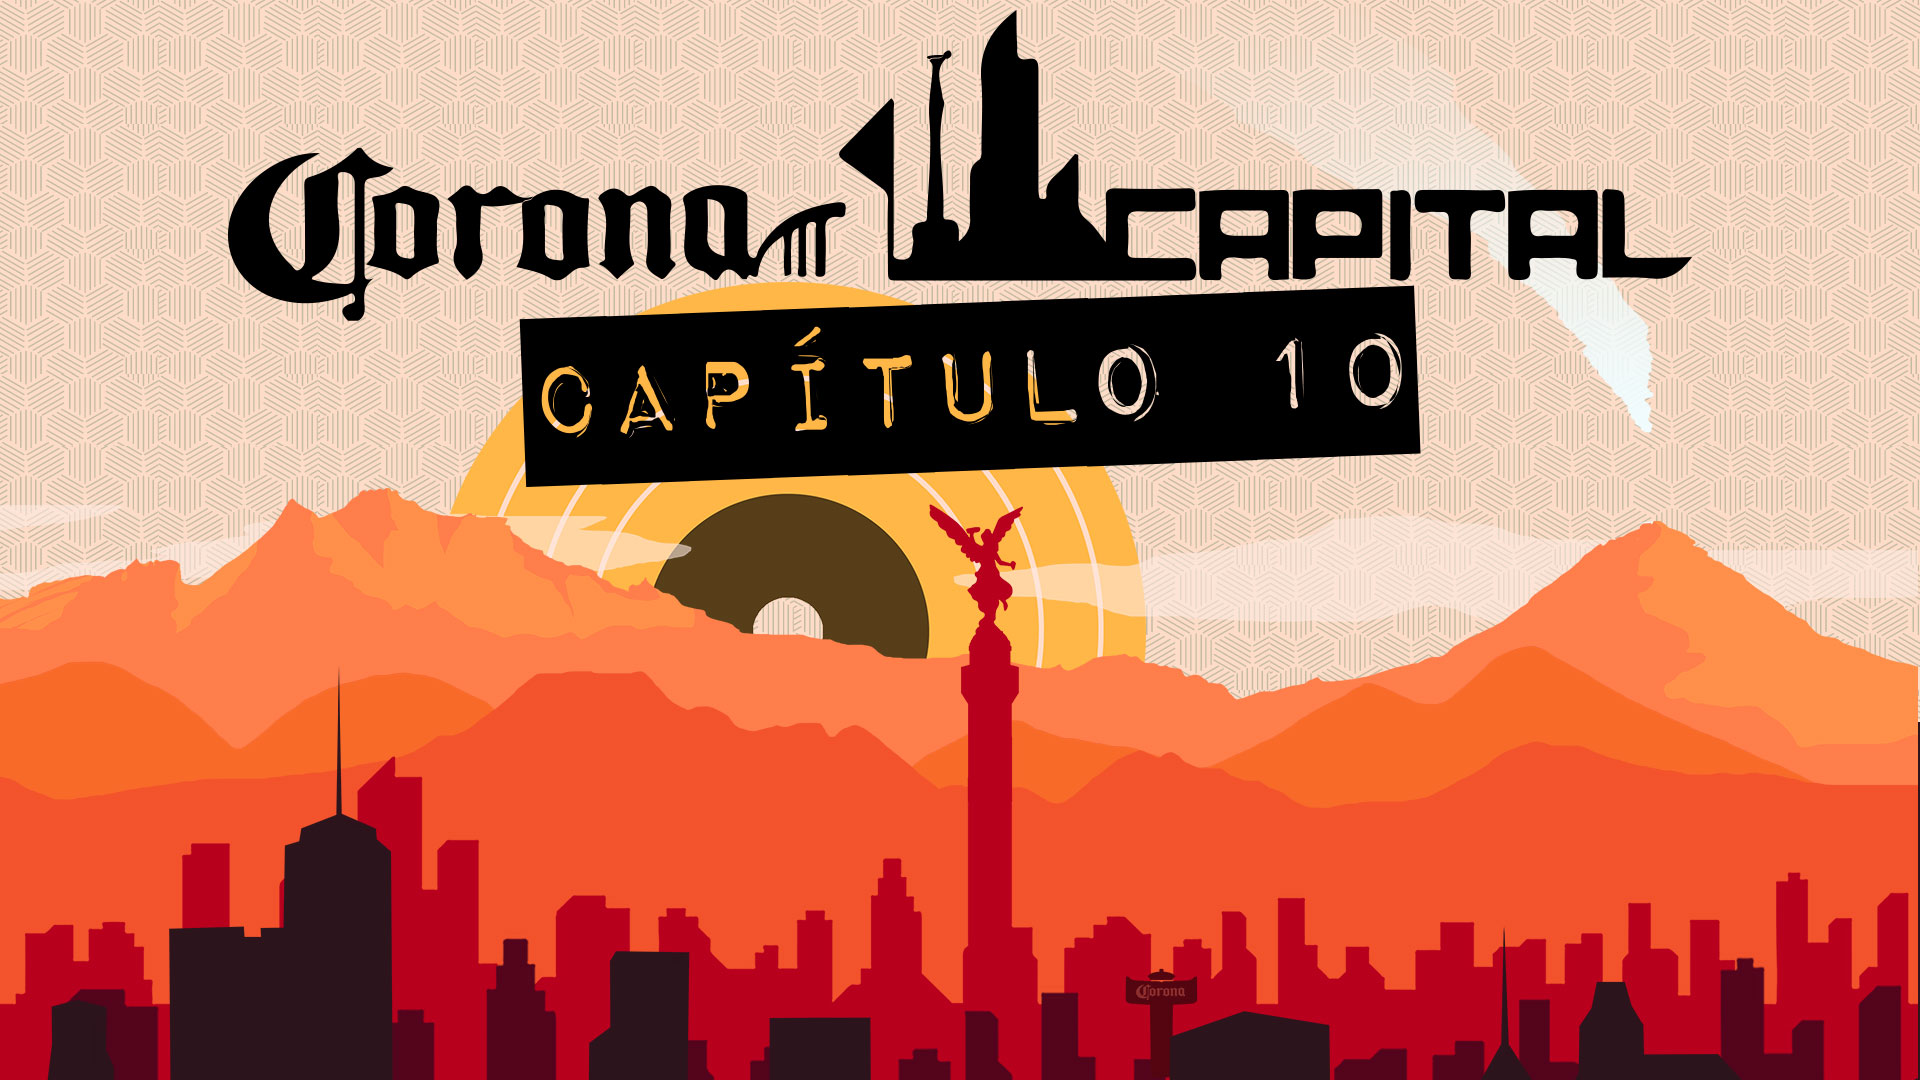 Corona Capital Capítulo 10